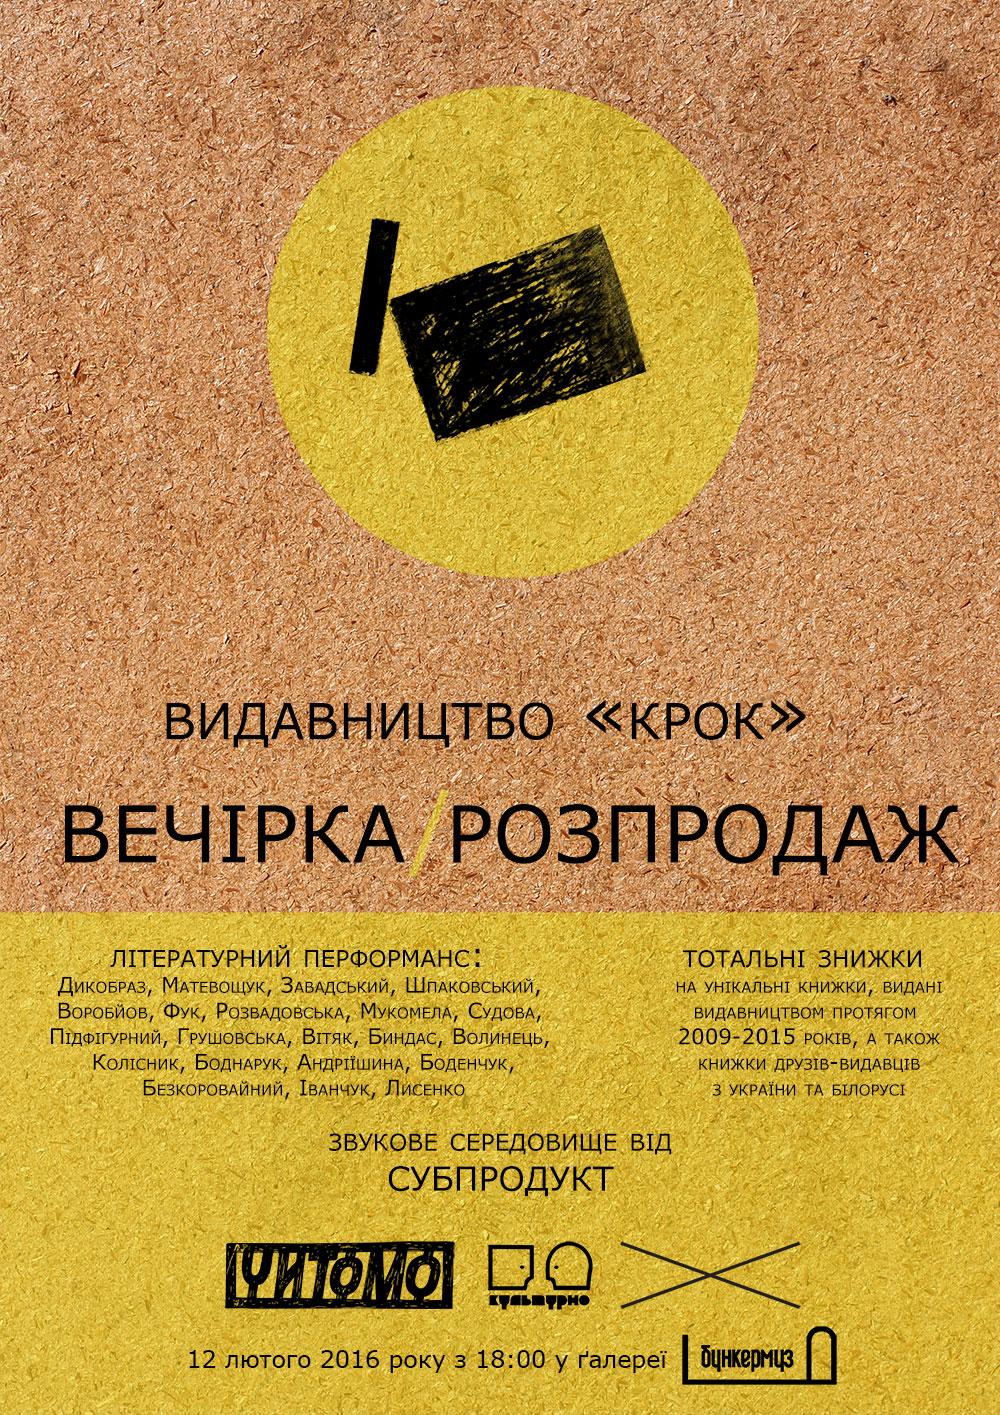 KROK_rozprodazh_12-02-16_web